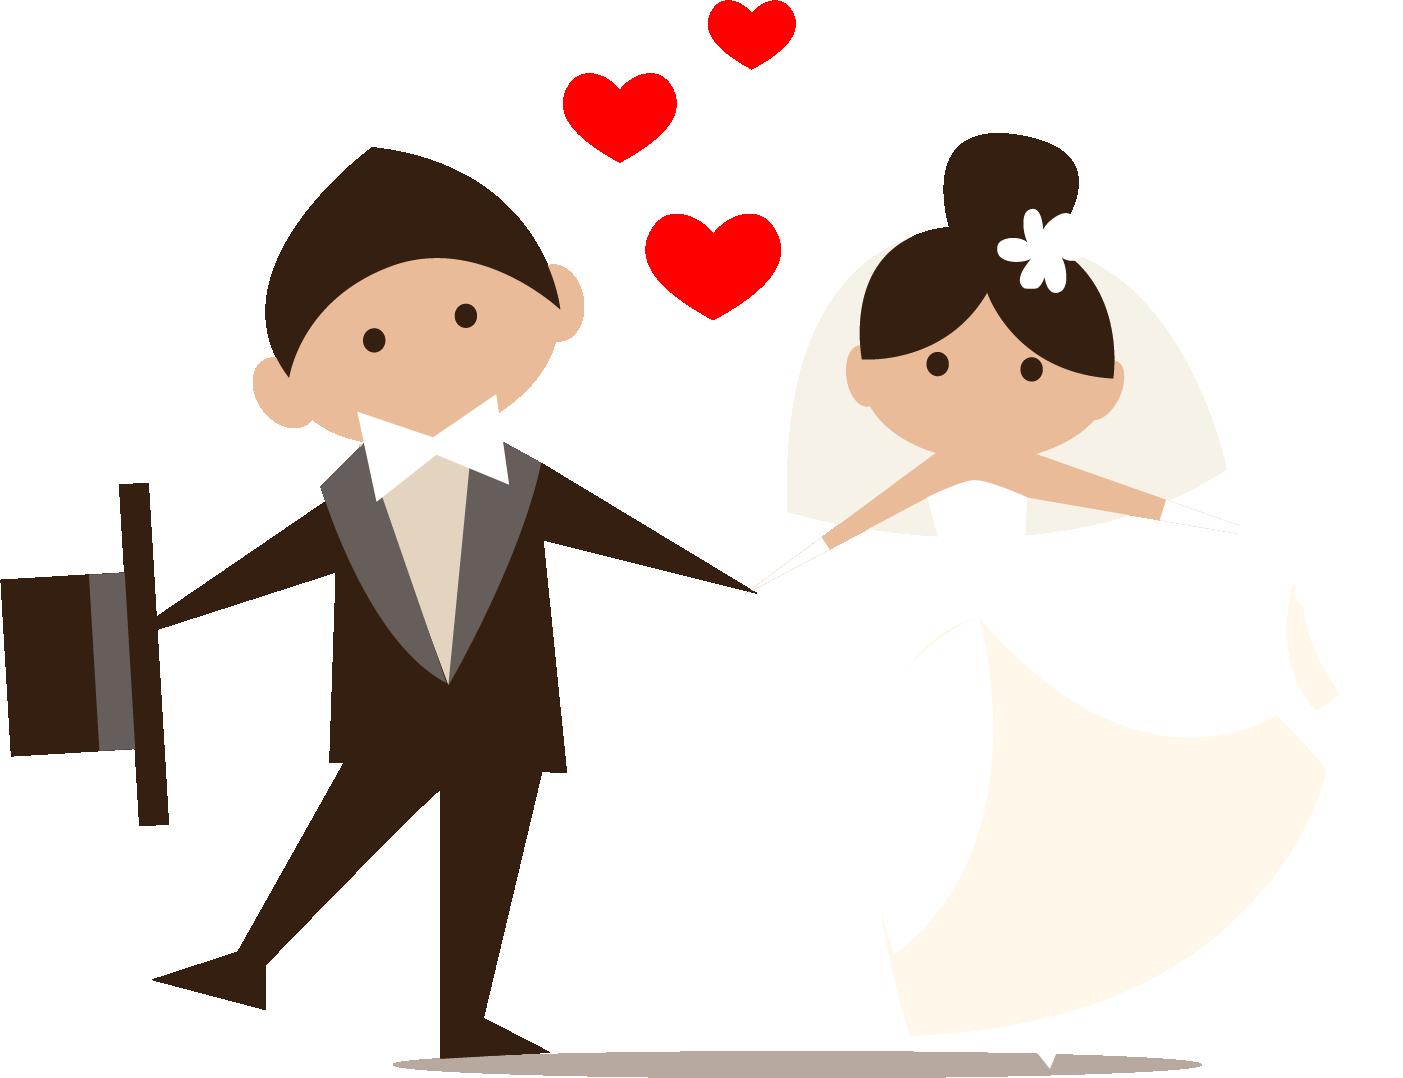 Wedding Clipart at GetDrawings.com.